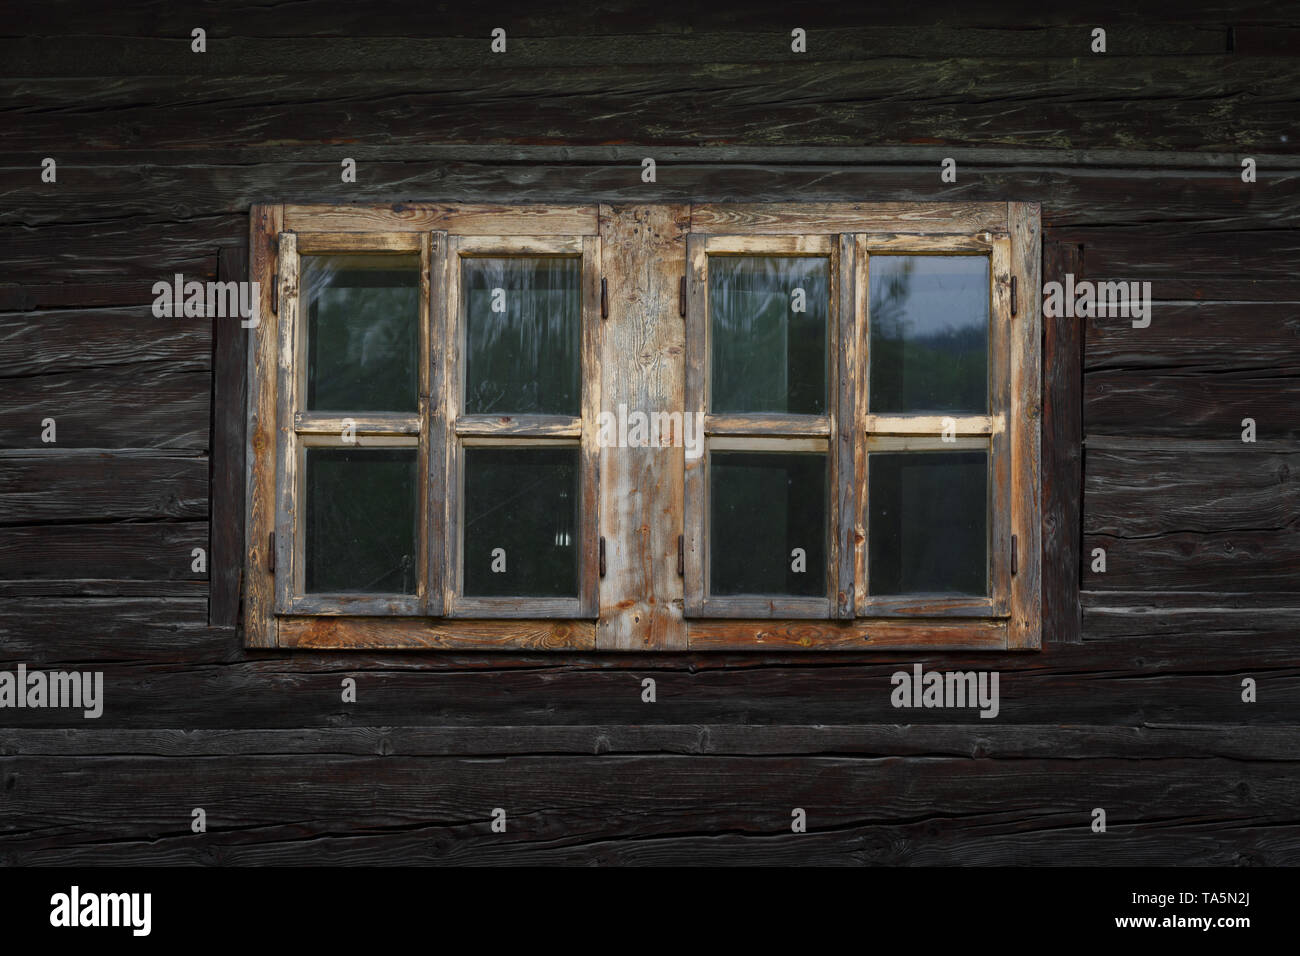 Traditional log cabin in Orava region, Slovakia. - Stock Image